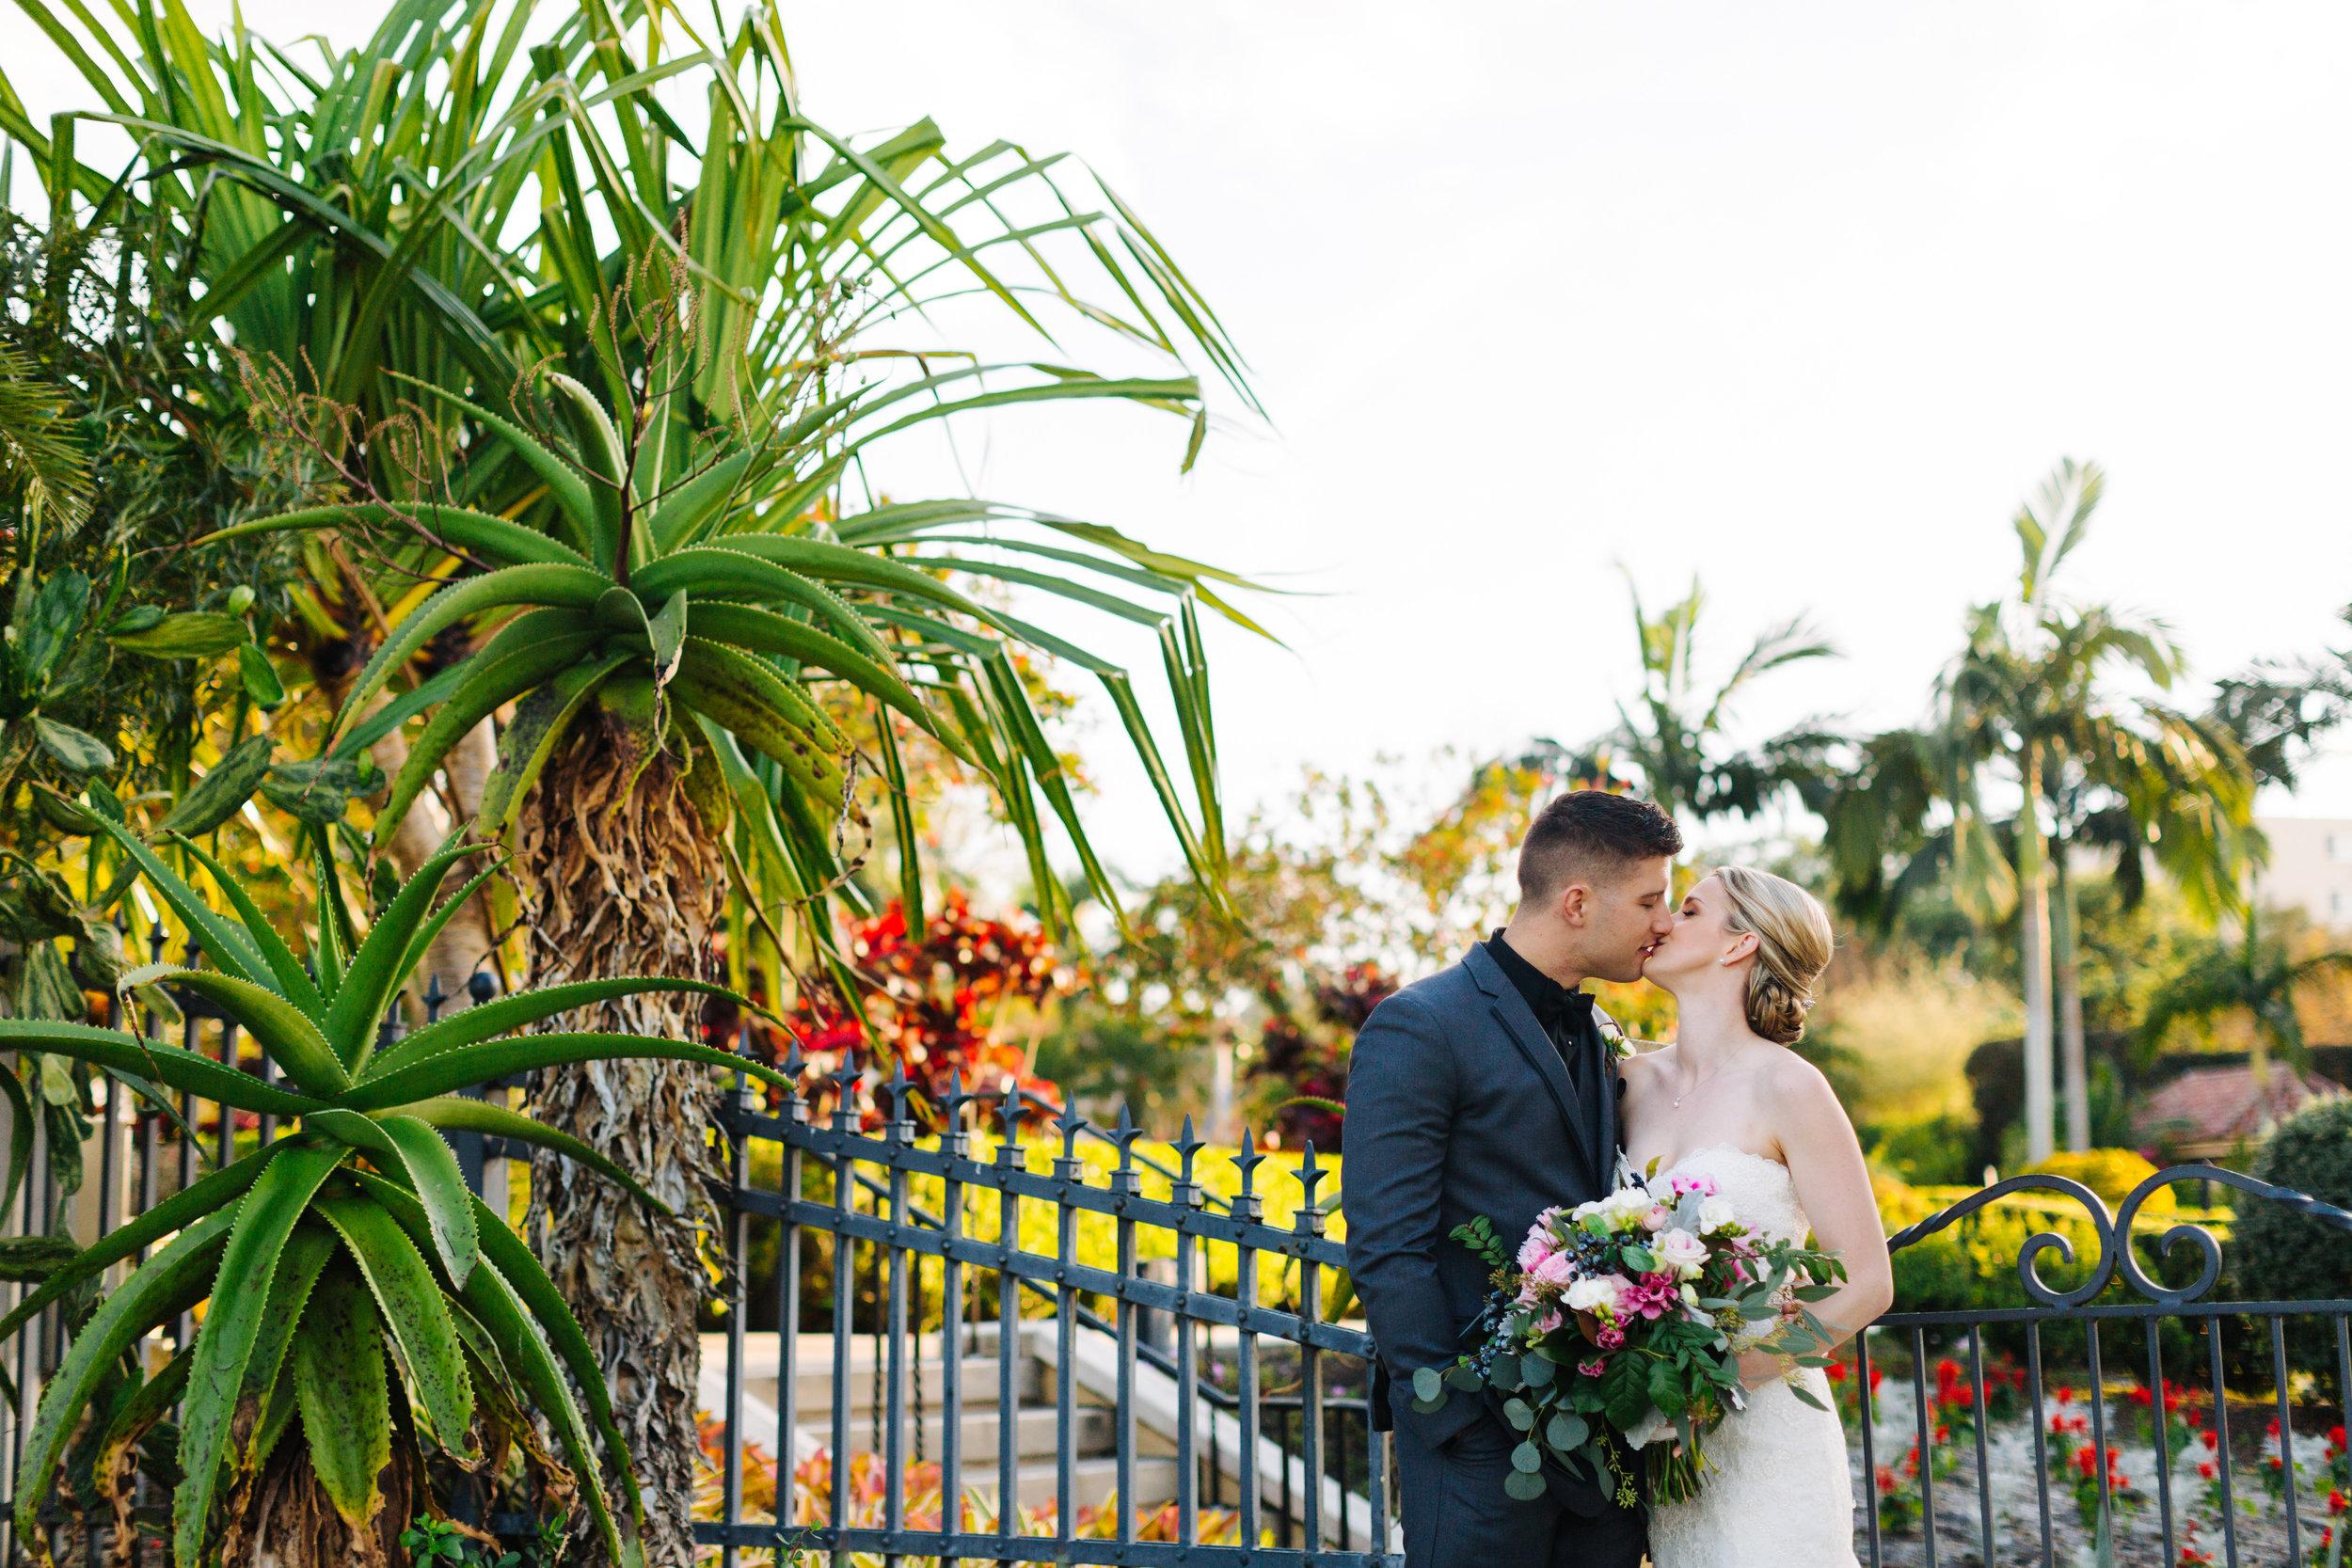 hollis gardens wedding downtown lakeland wedding jake and katie photography-32.jpg